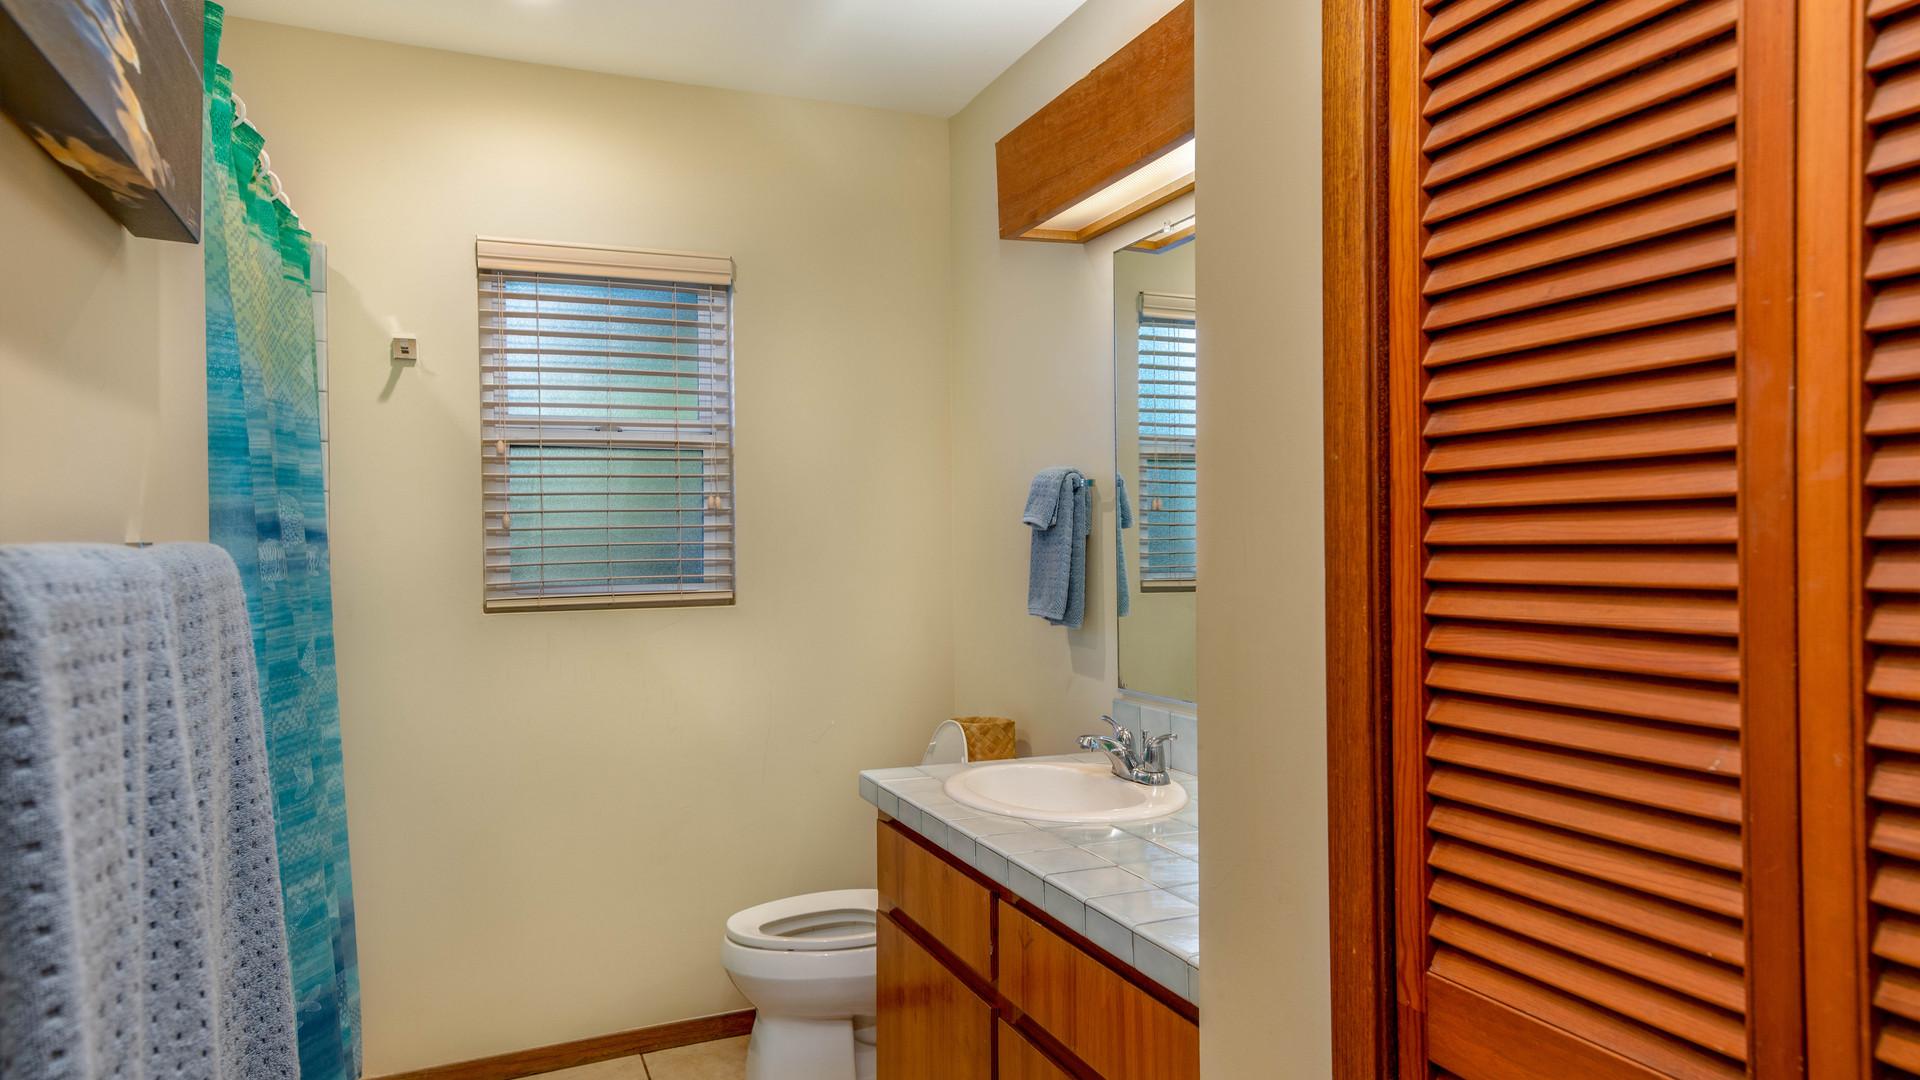 18-2nd bathroom.jpg